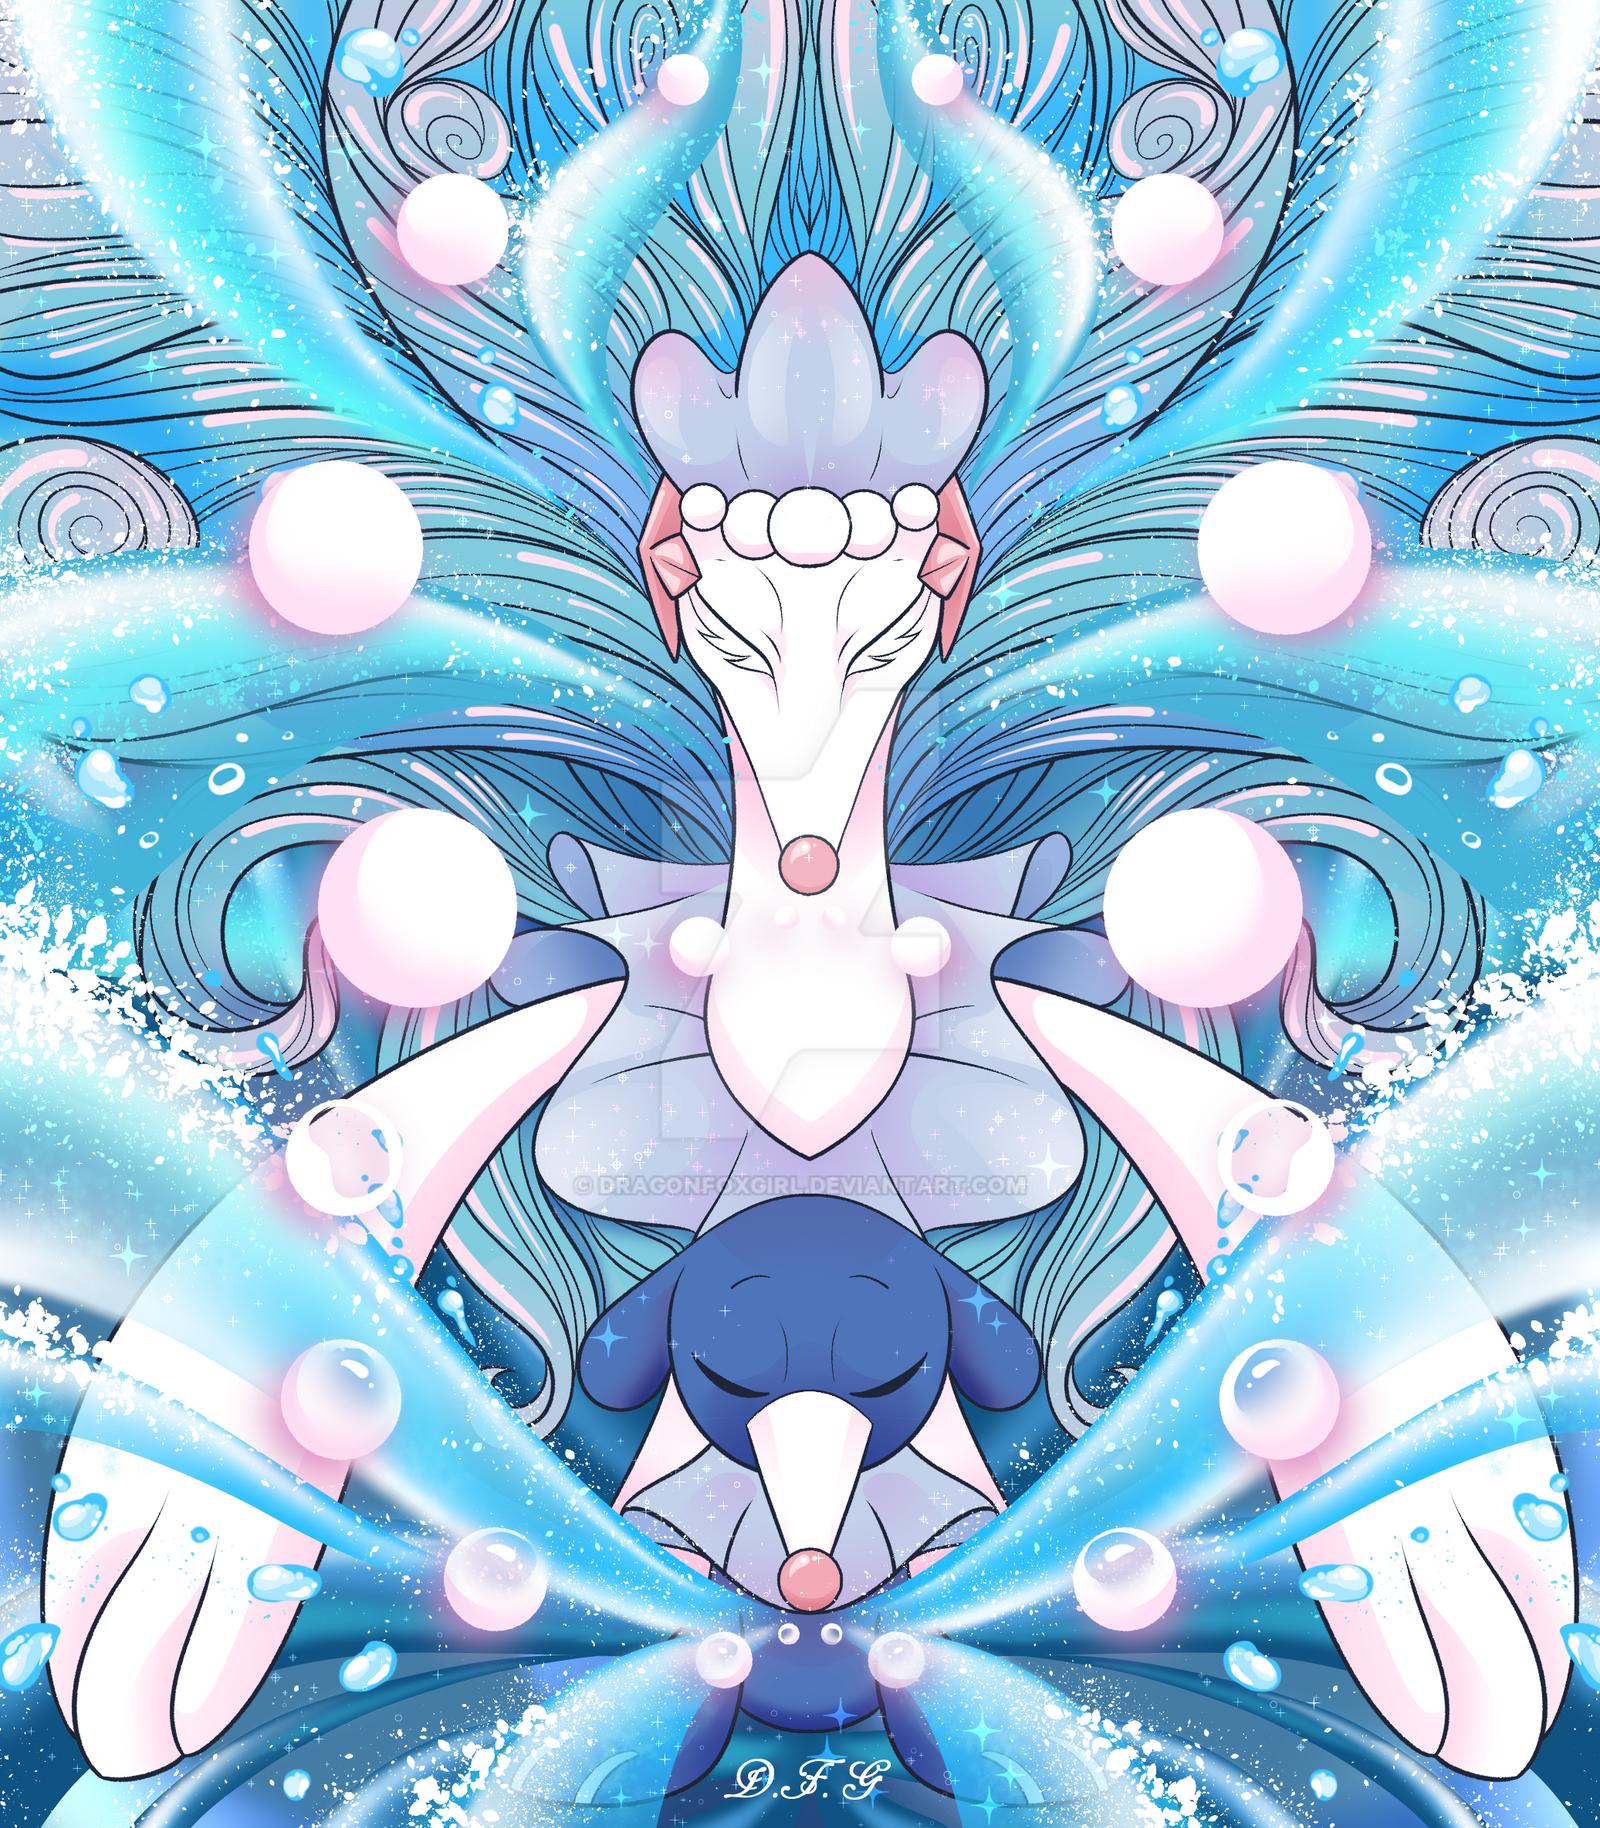 The Fairy Dog of the Sea by Dragonfoxgirl